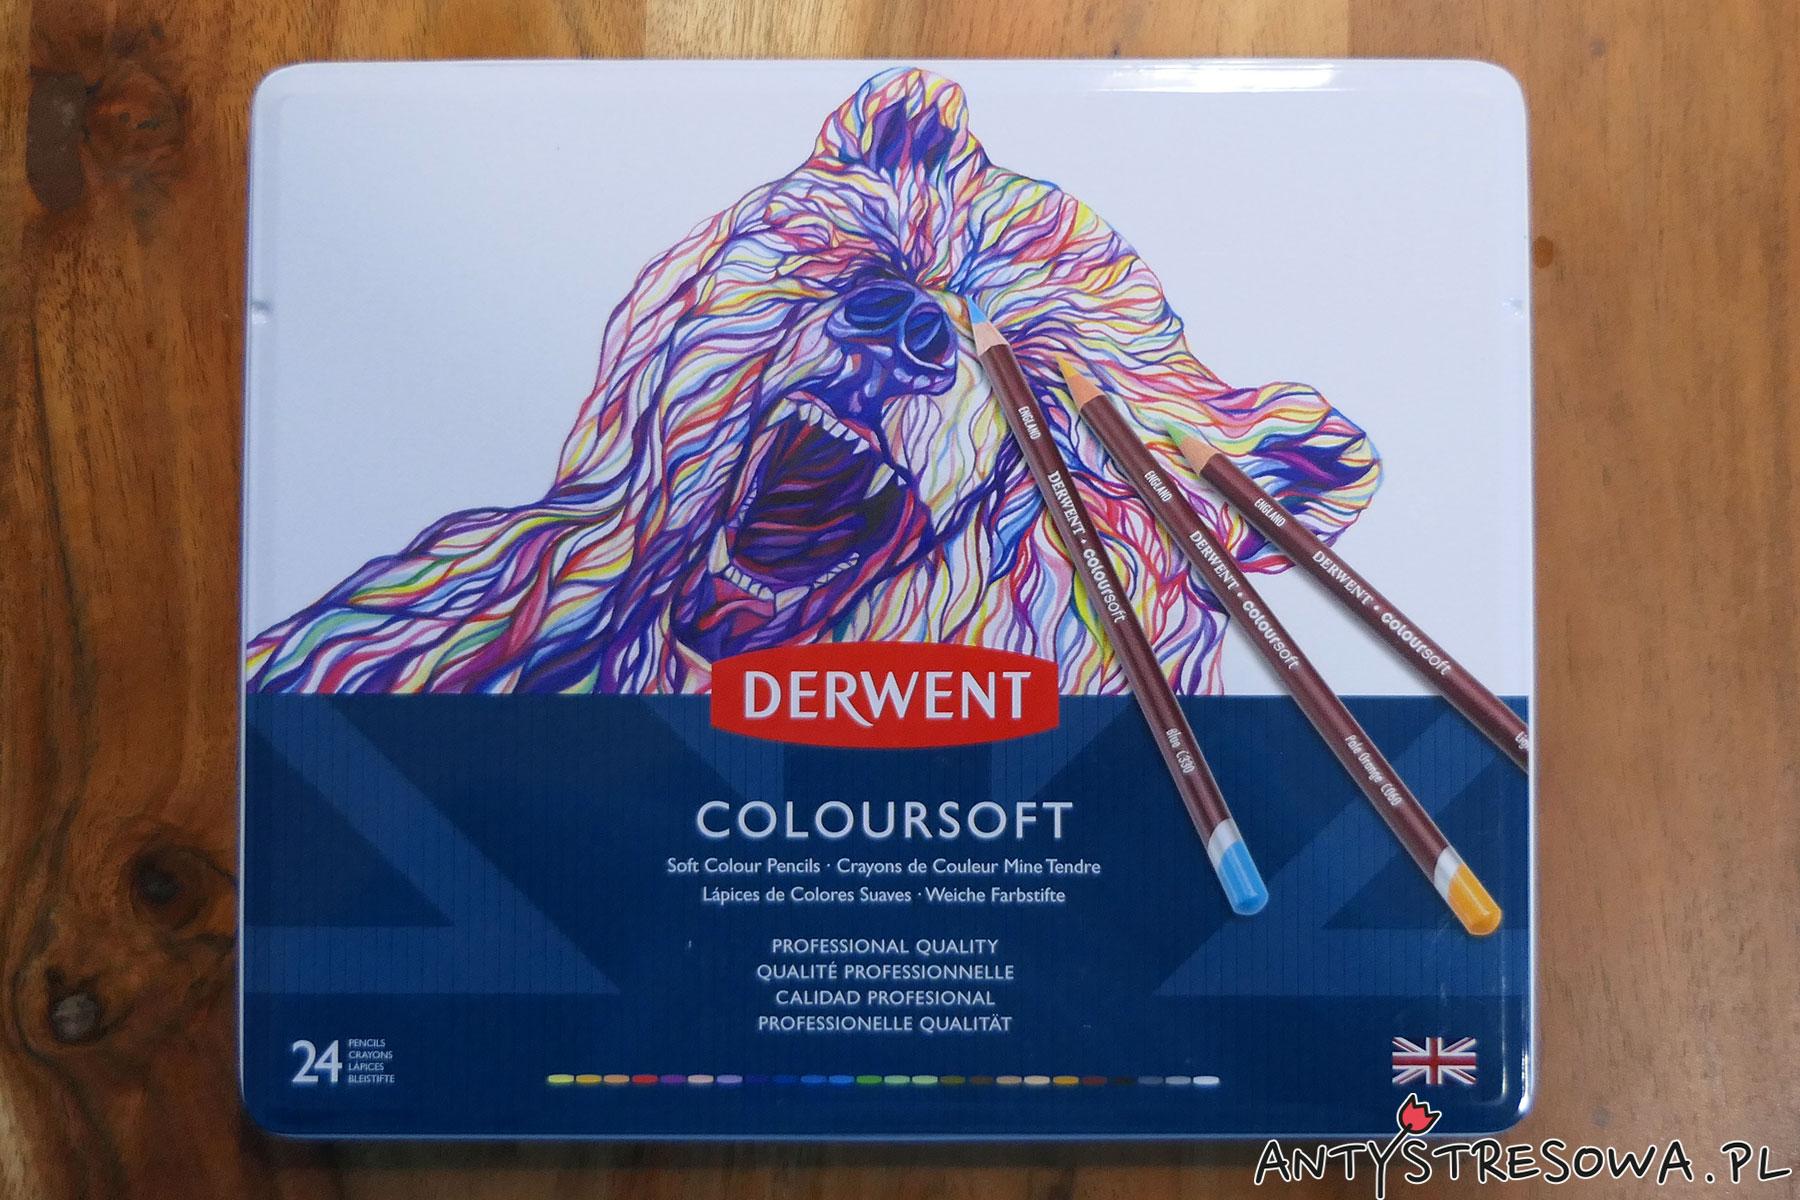 Kredki Derwent Coloursoft 24 kolory - test i recenzja